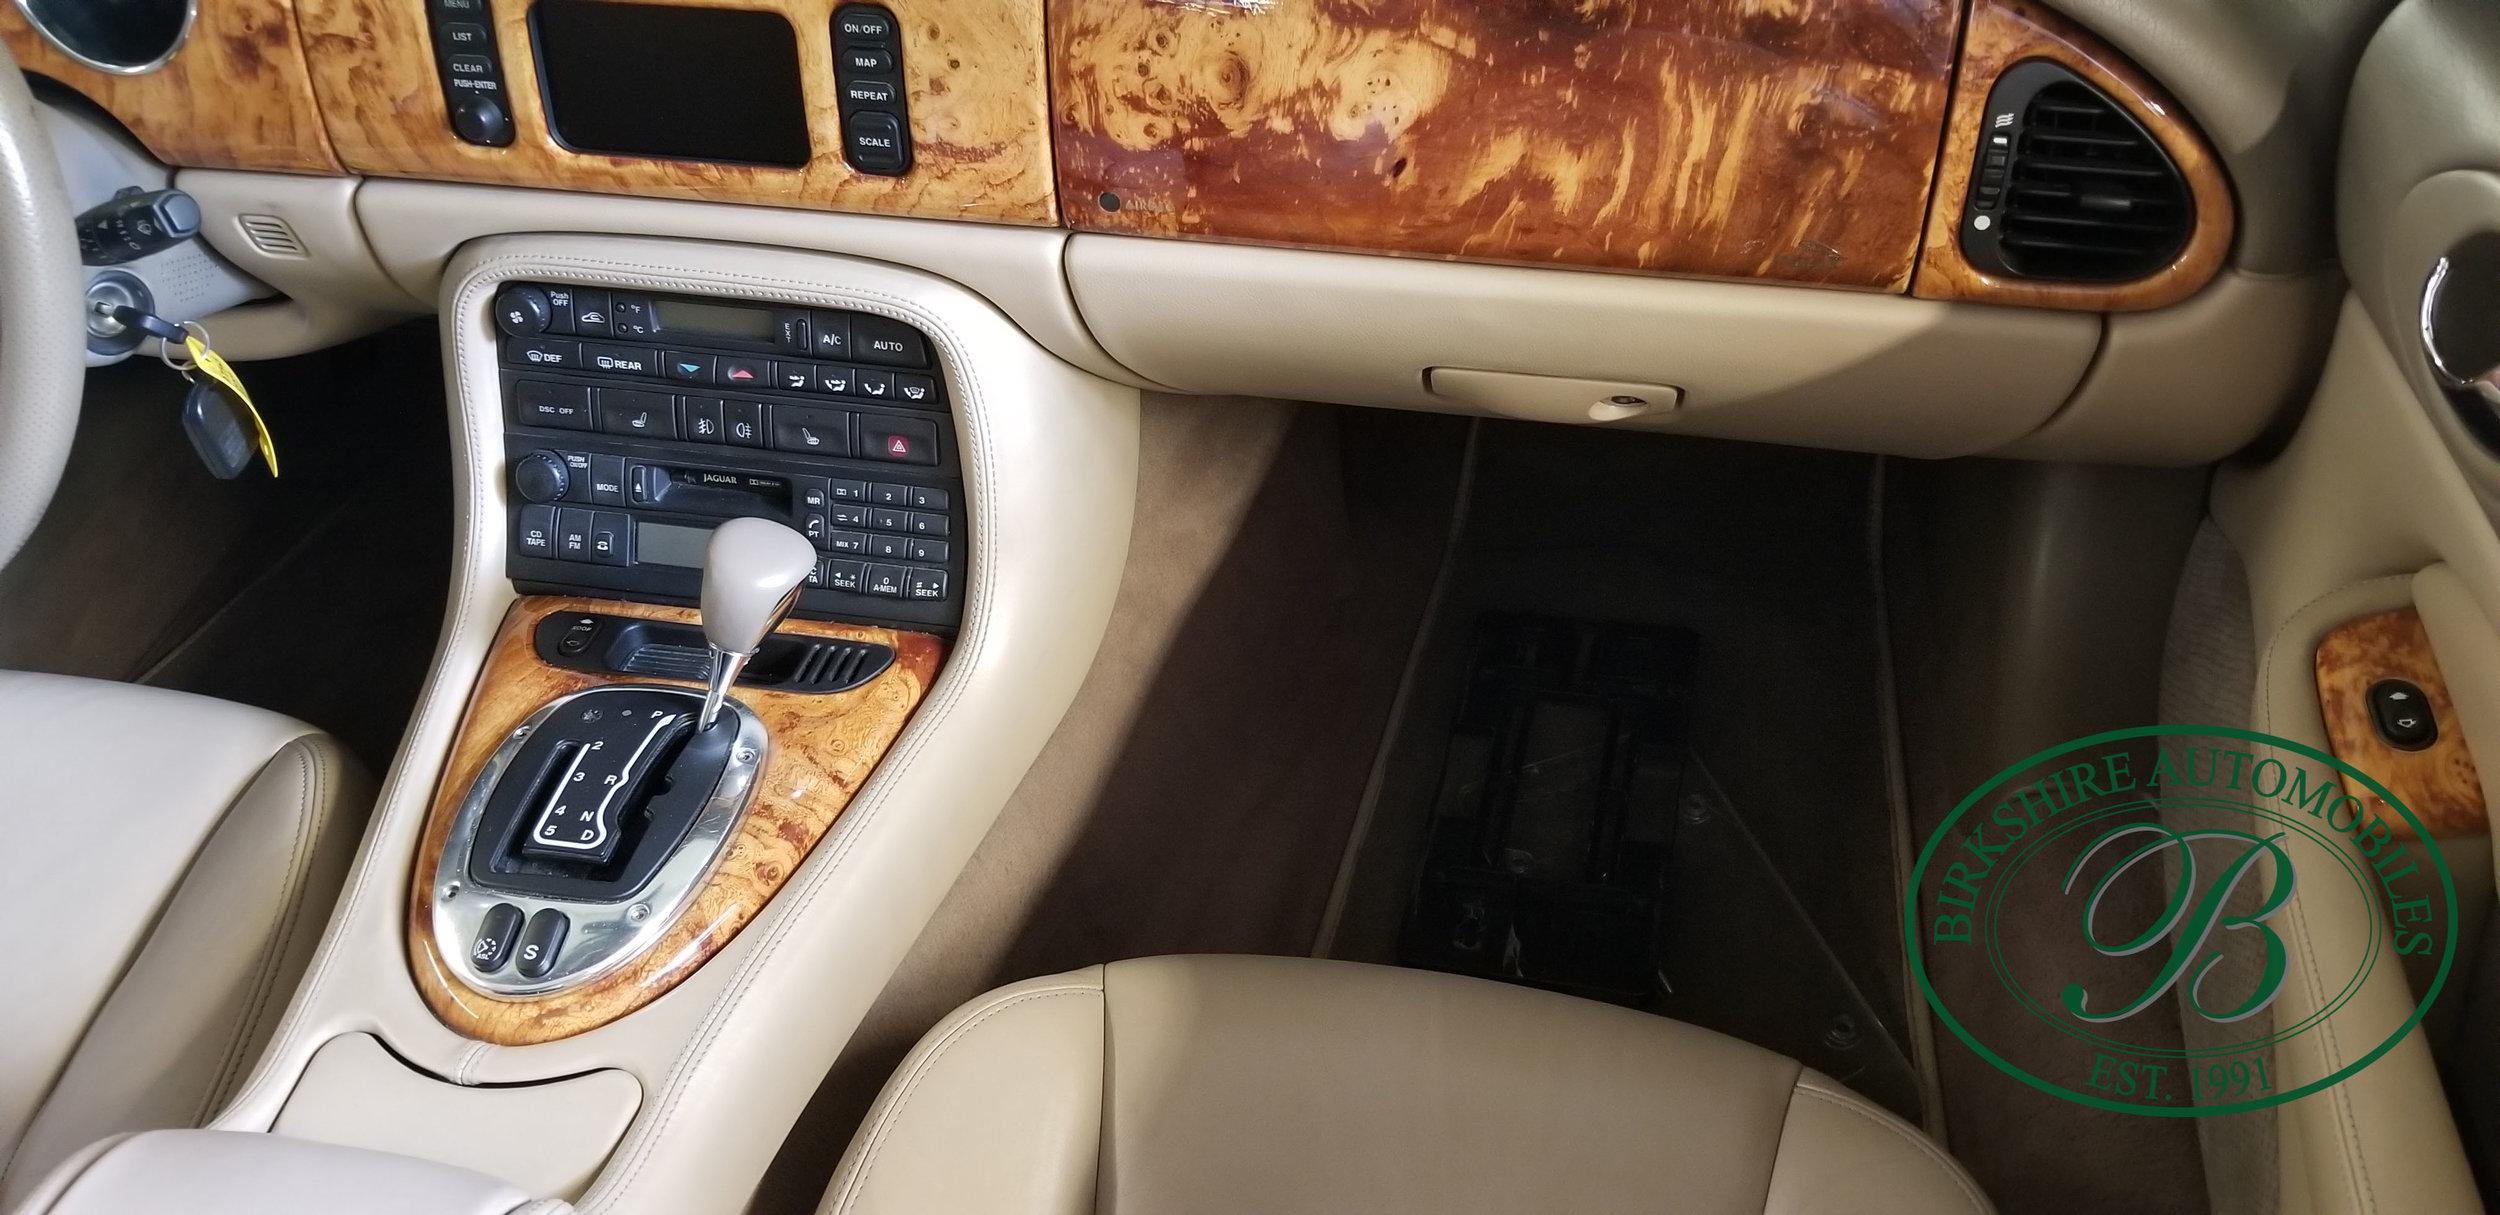 2006 Jaguar XK8 Convertible - Birkshire Automobiles Thornhill (47).jpg